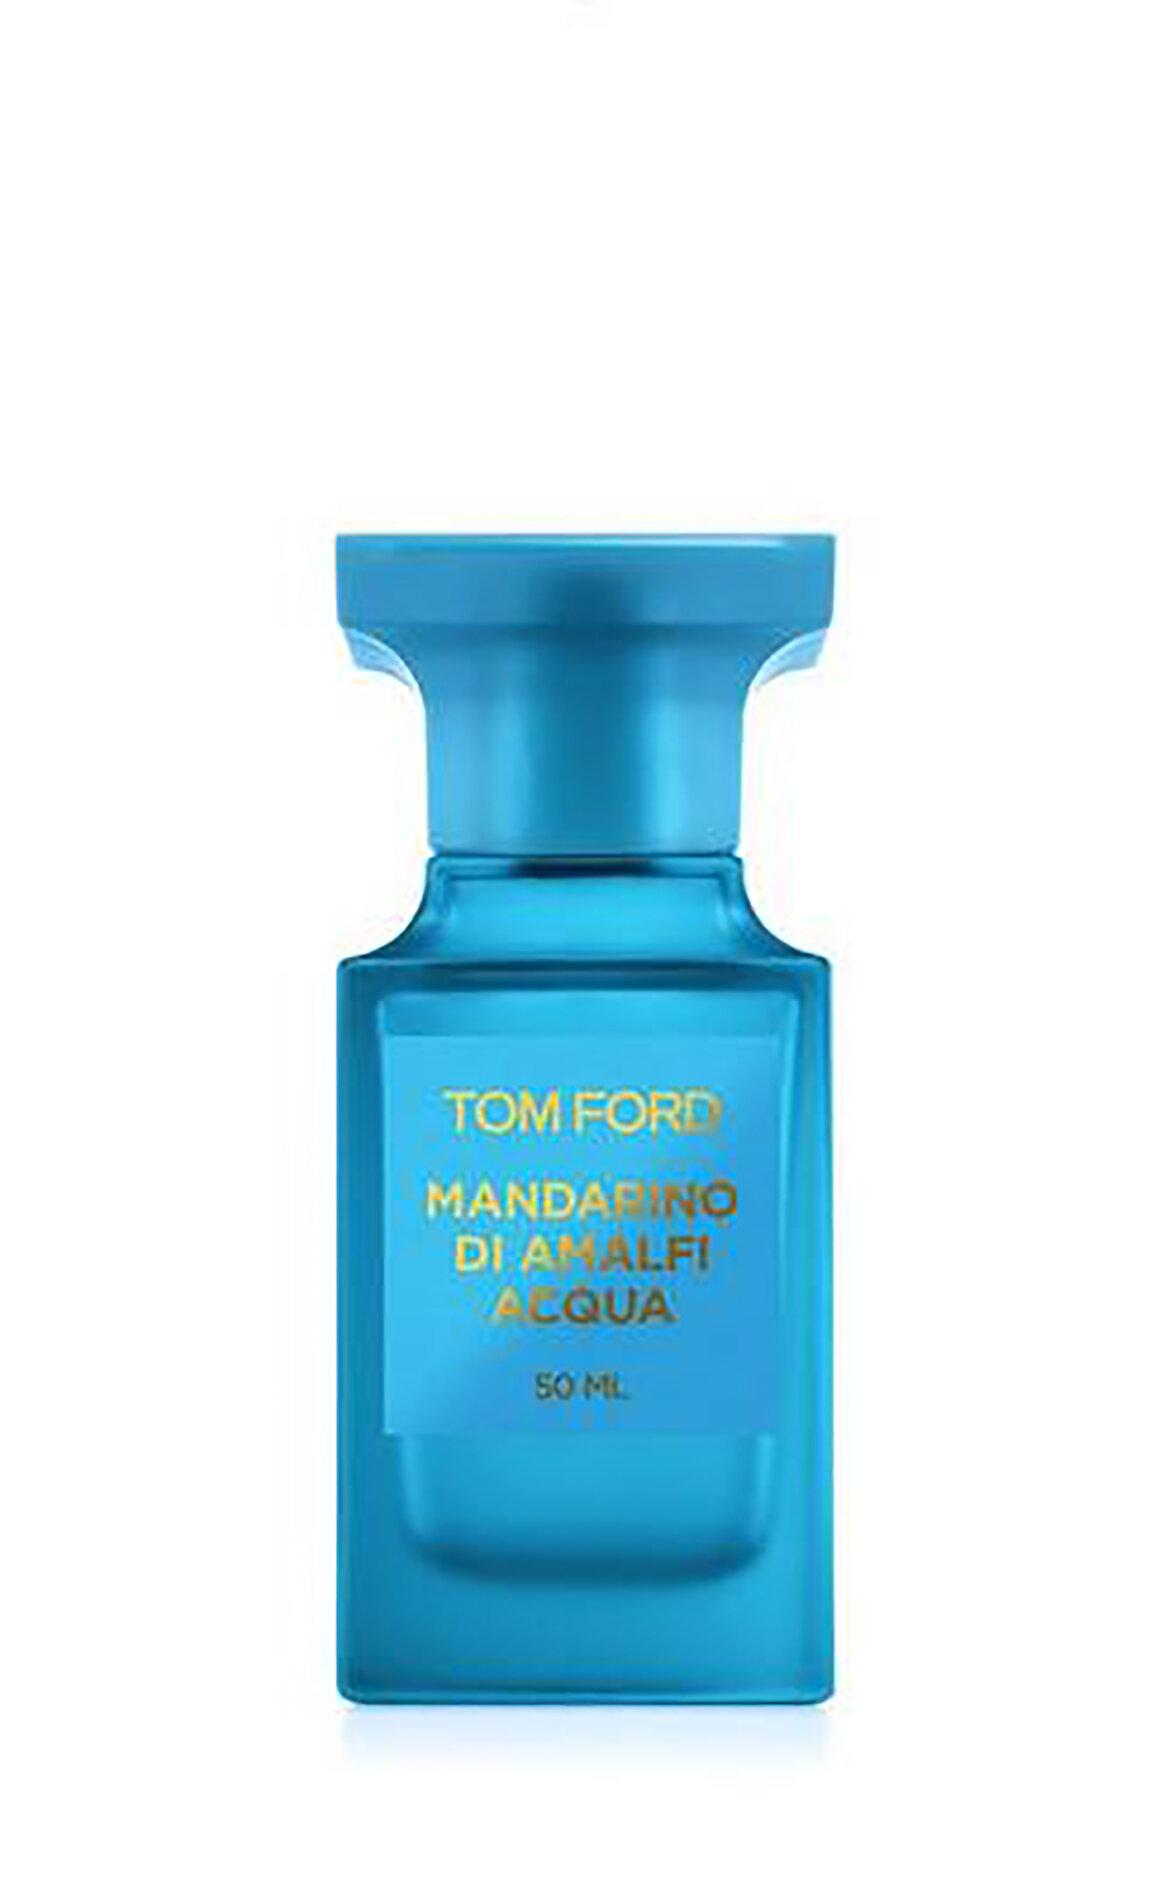 Tom Ford-Tom Ford Mandarino Di Amalfi Acqua Parfüm 50 ml